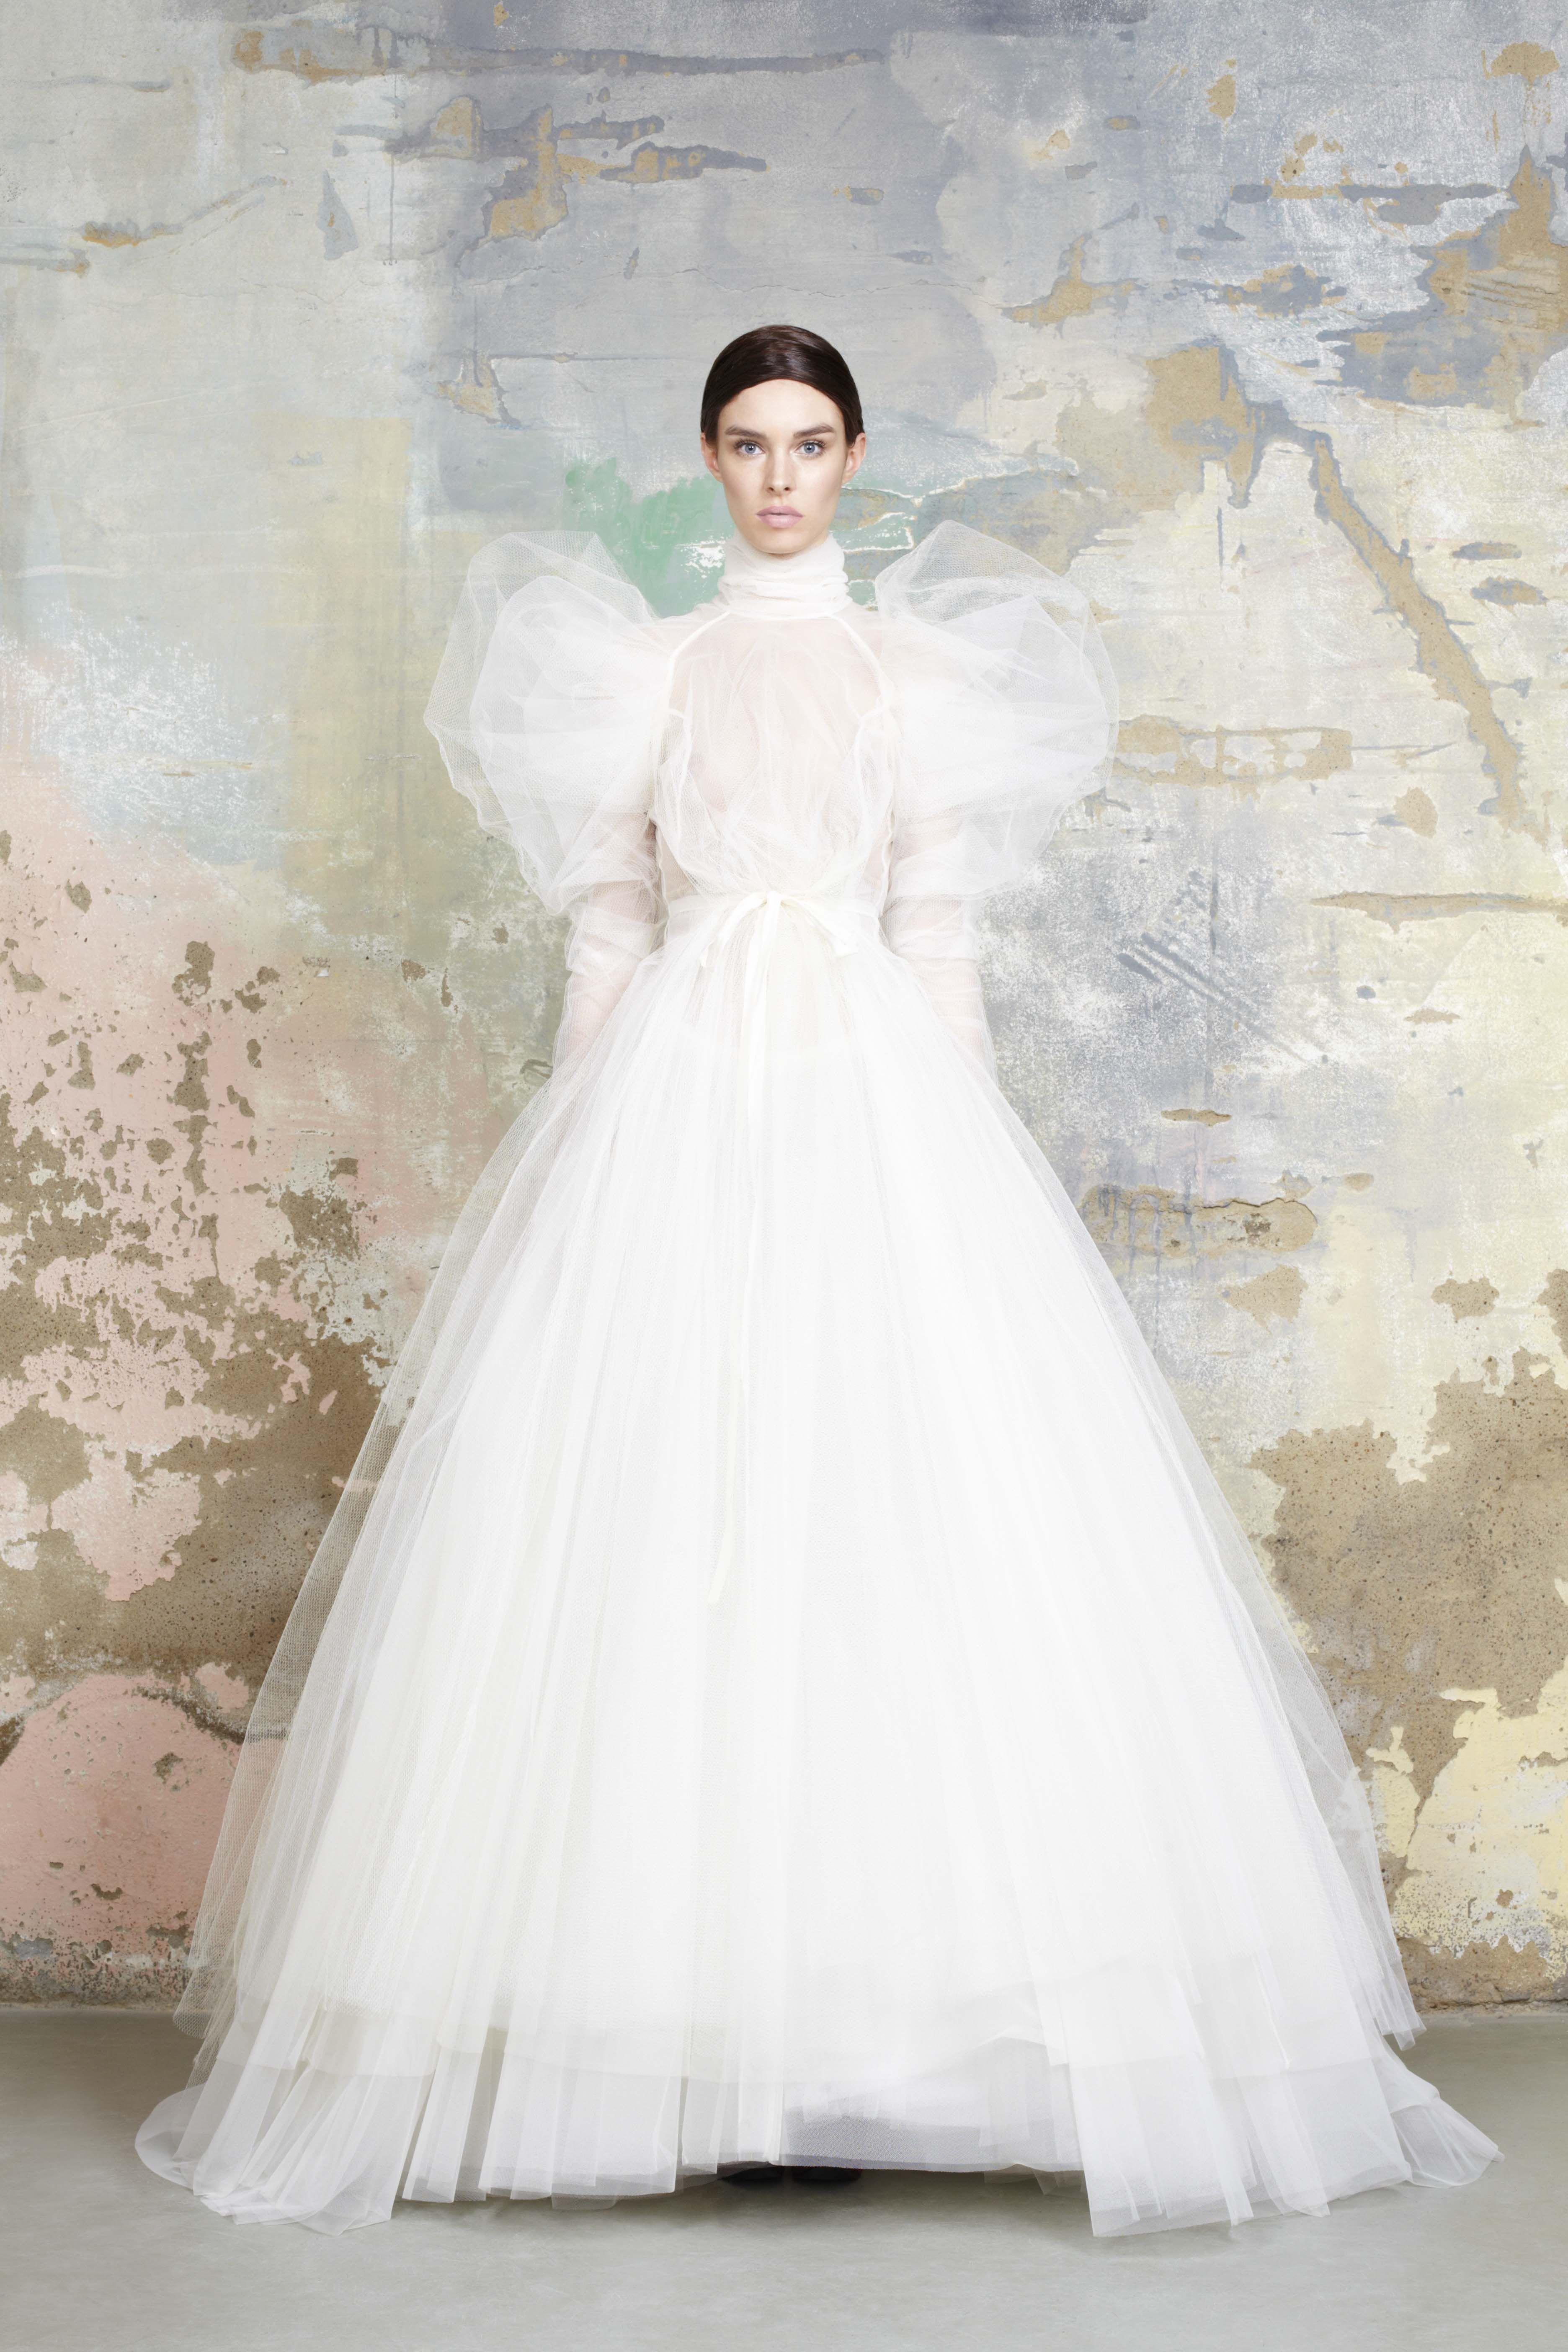 Bridal & Couture   Pinterest   Vivienne westwood, Vivienne and ...